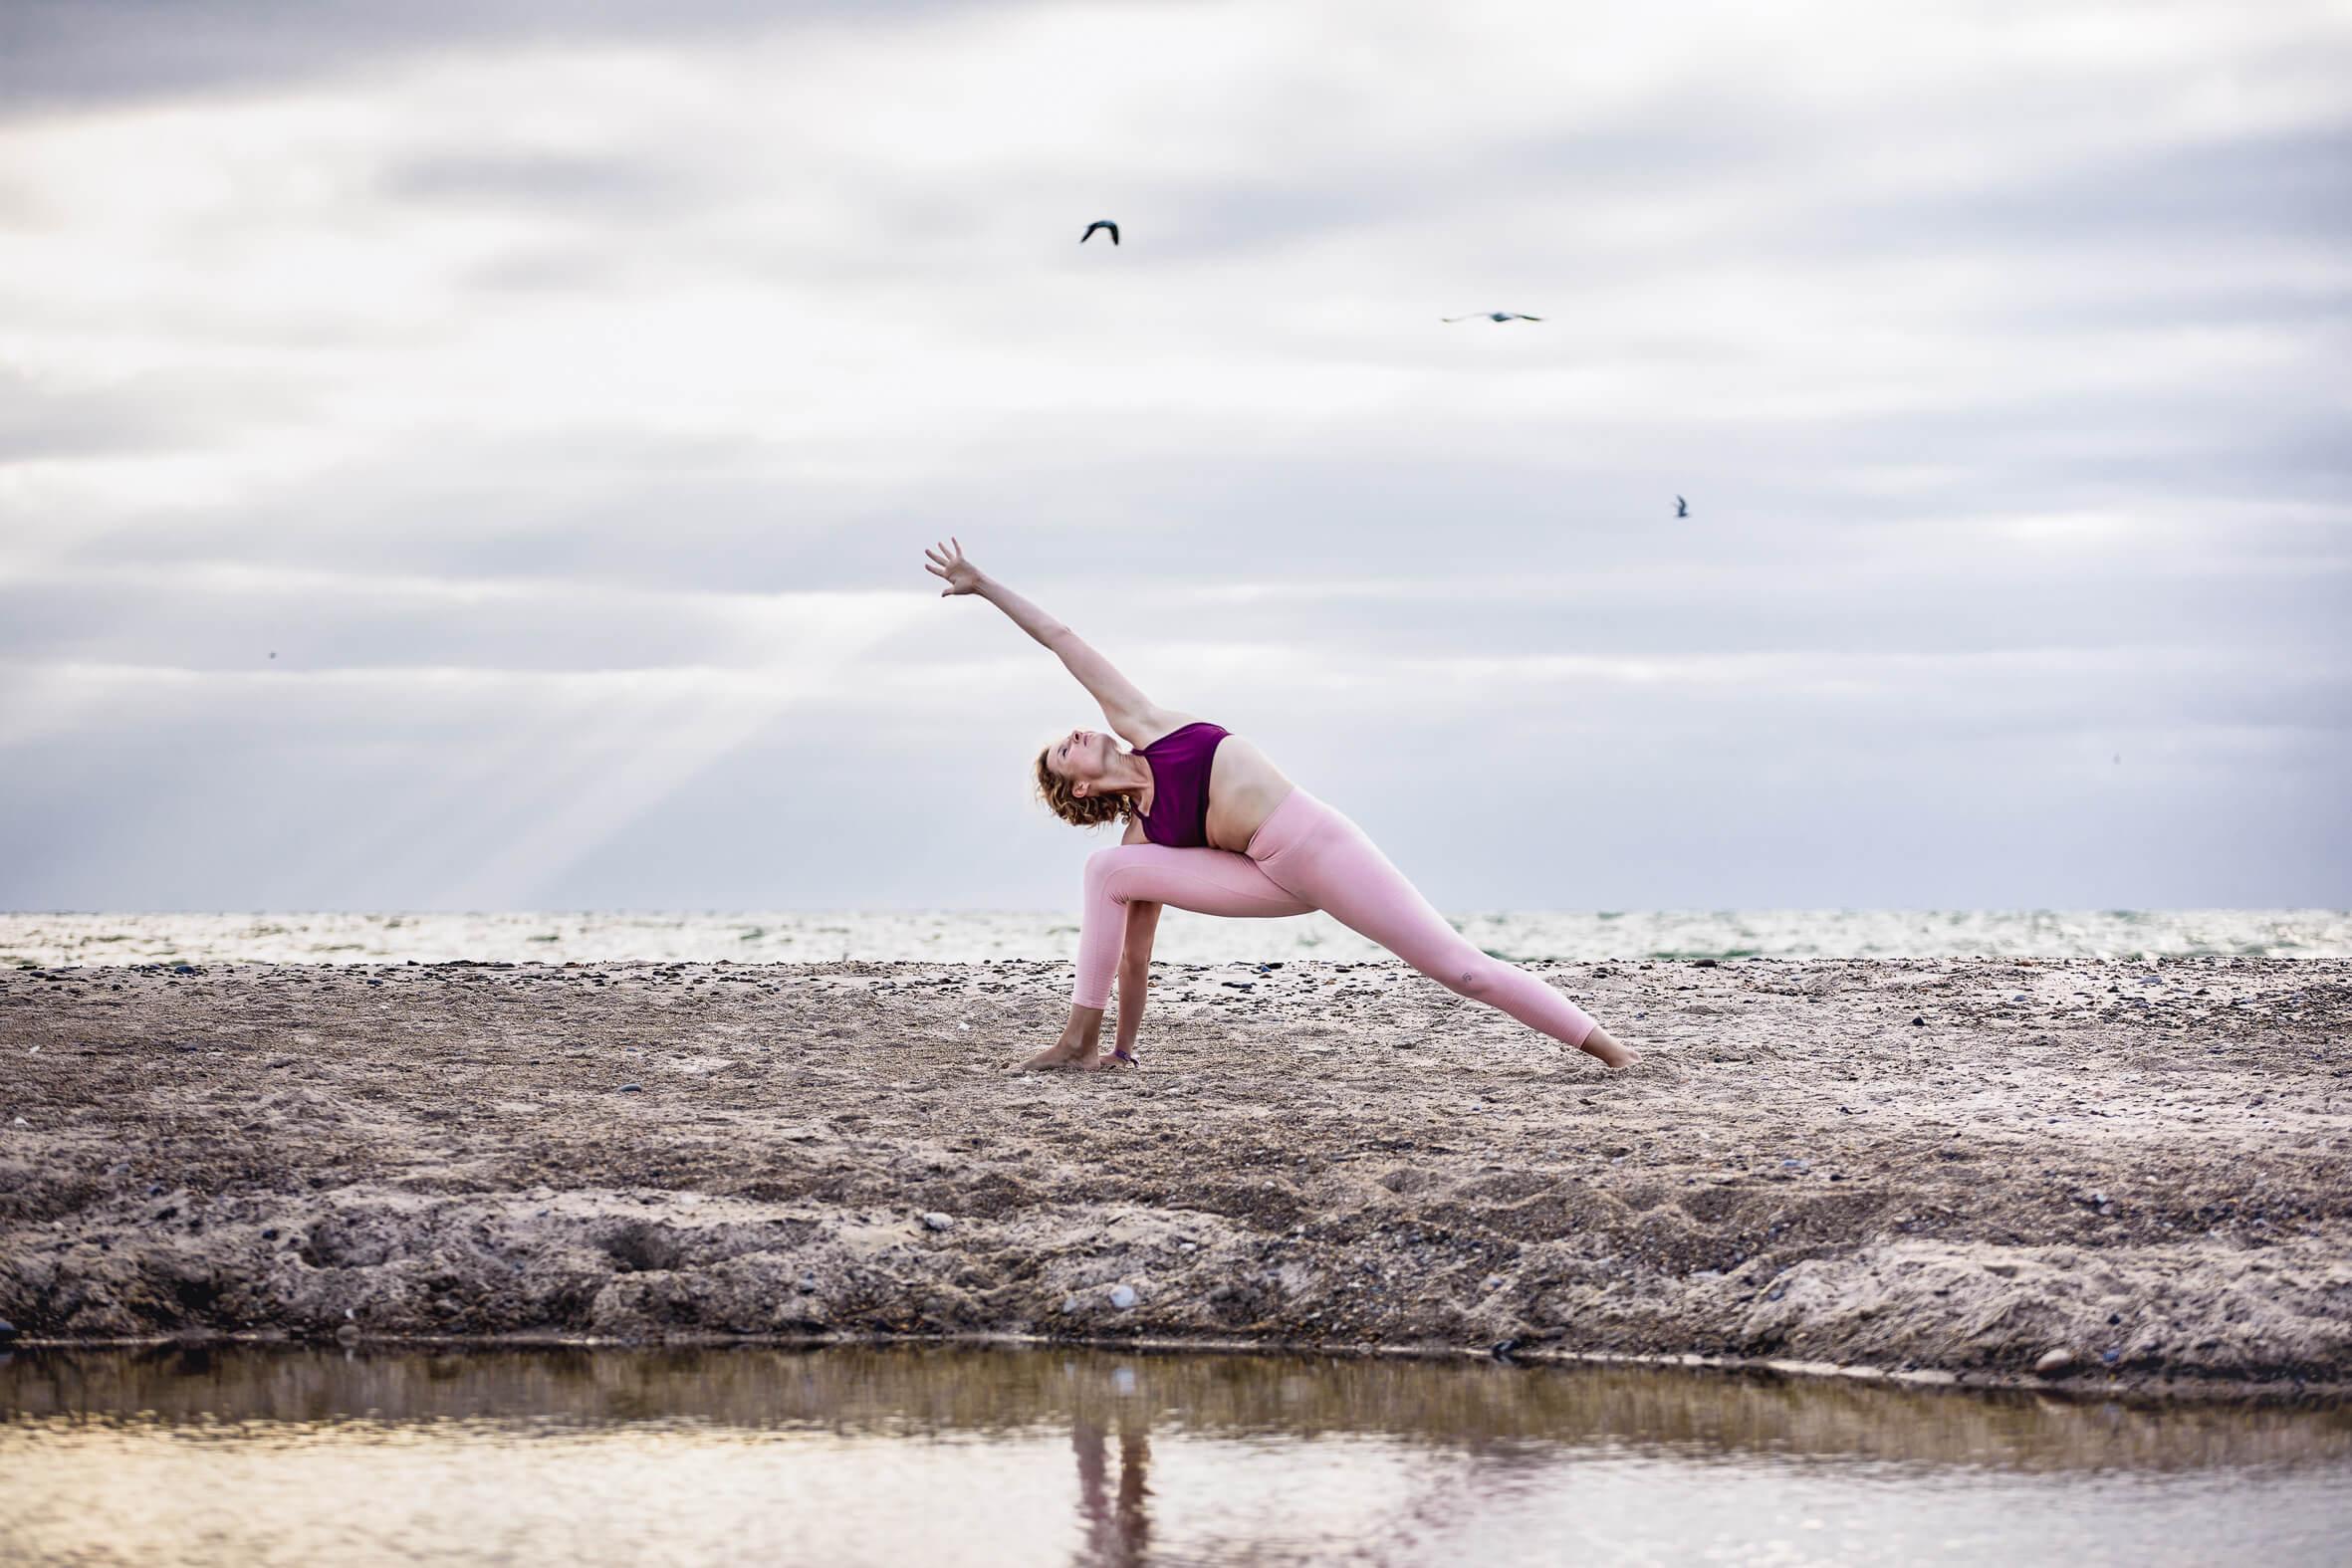 Sandra Mühmel-yoga-meditation-yogateacher-traveling-beach-Utthita Pārśvakoṇāsana